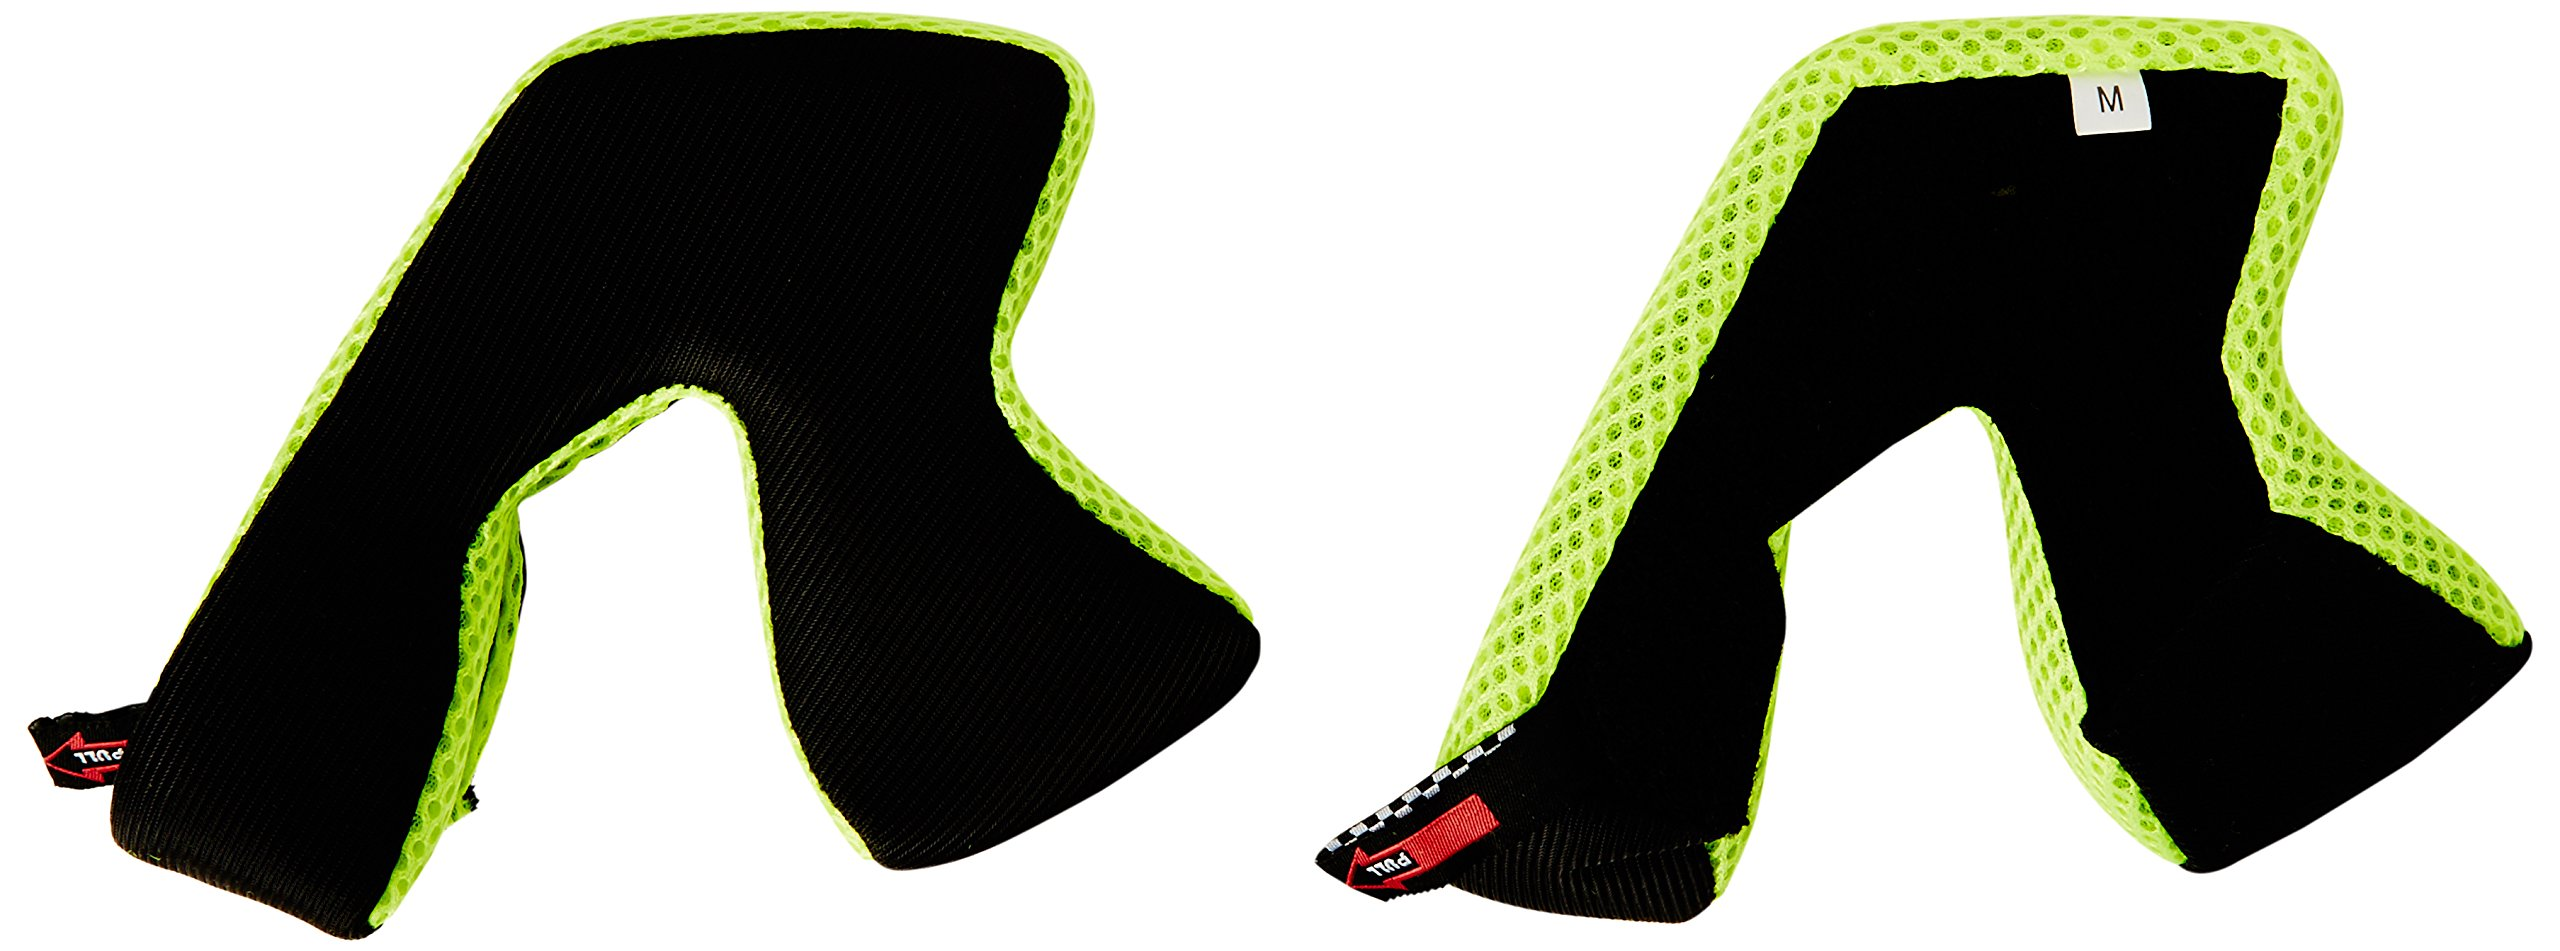 Troy Lee Designs Adult D3 Cheekpad BMX Helmet Accessories - Yellow / 2X-Large